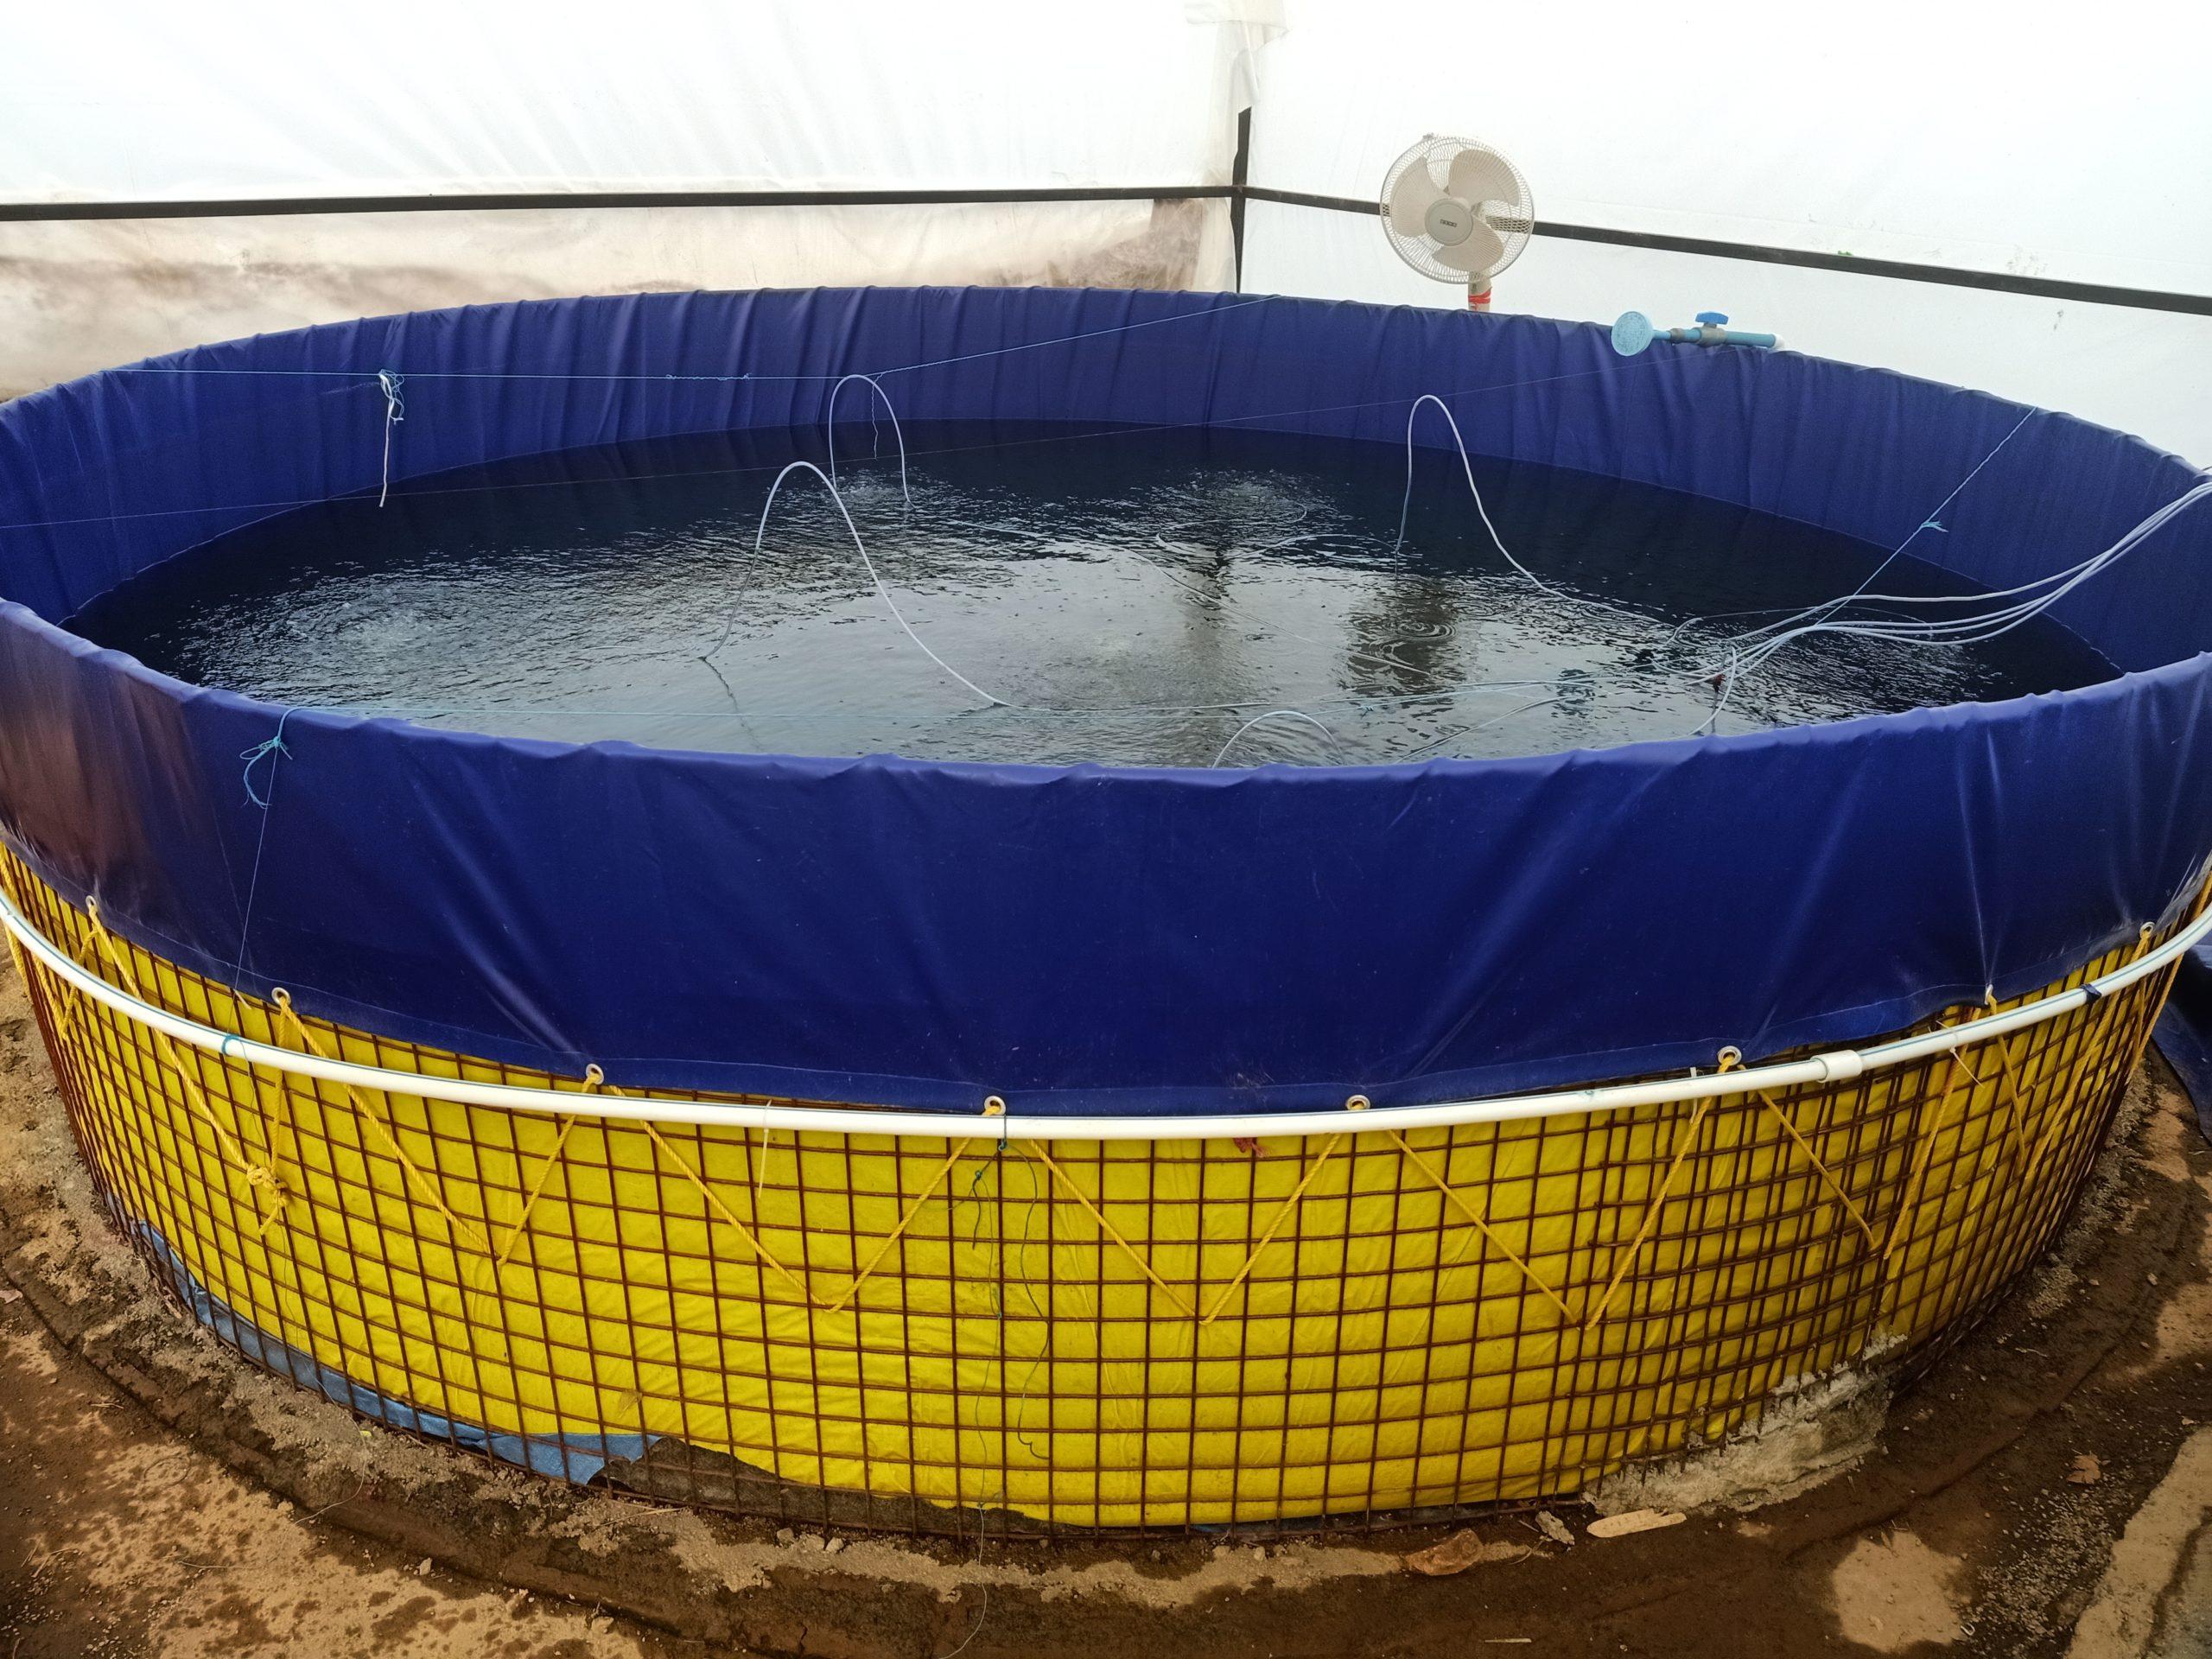 Keystone of future sustainable aquaculture – Biofloc